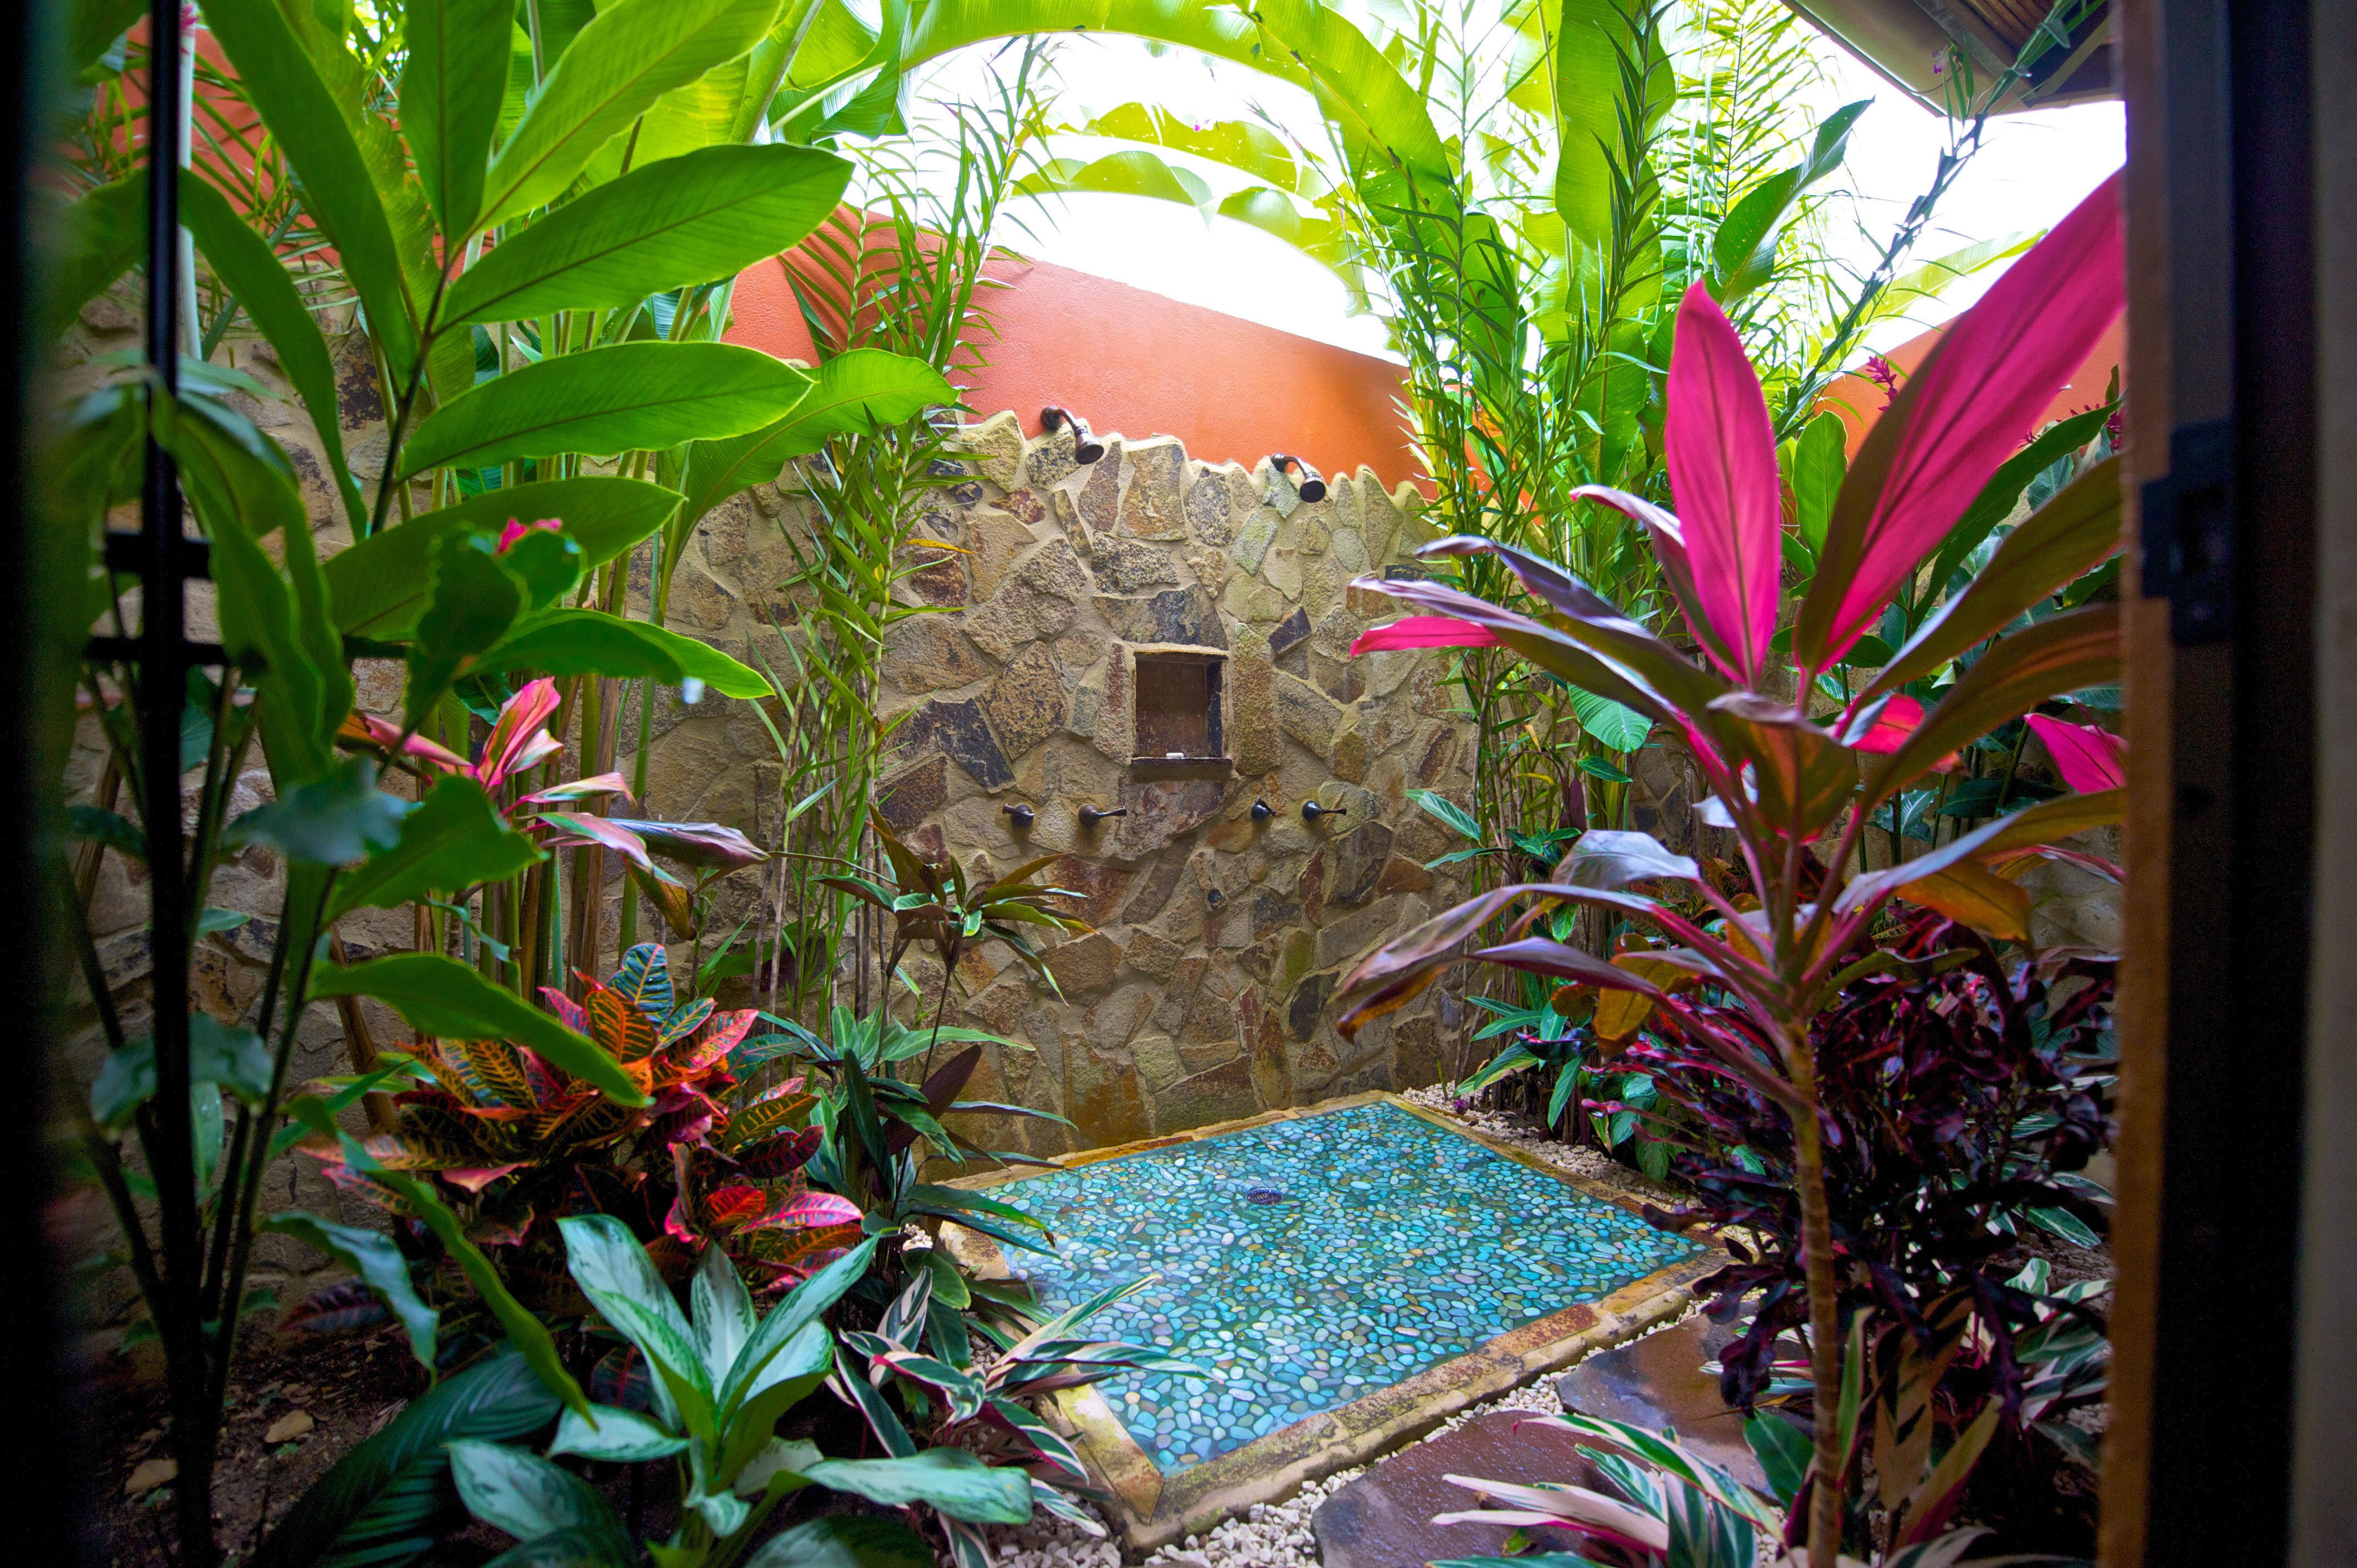 Bath Bedroom Country Eco Jungle Romantic Rustic Suite plant flower flora botany pot tropics Resort Garden palm